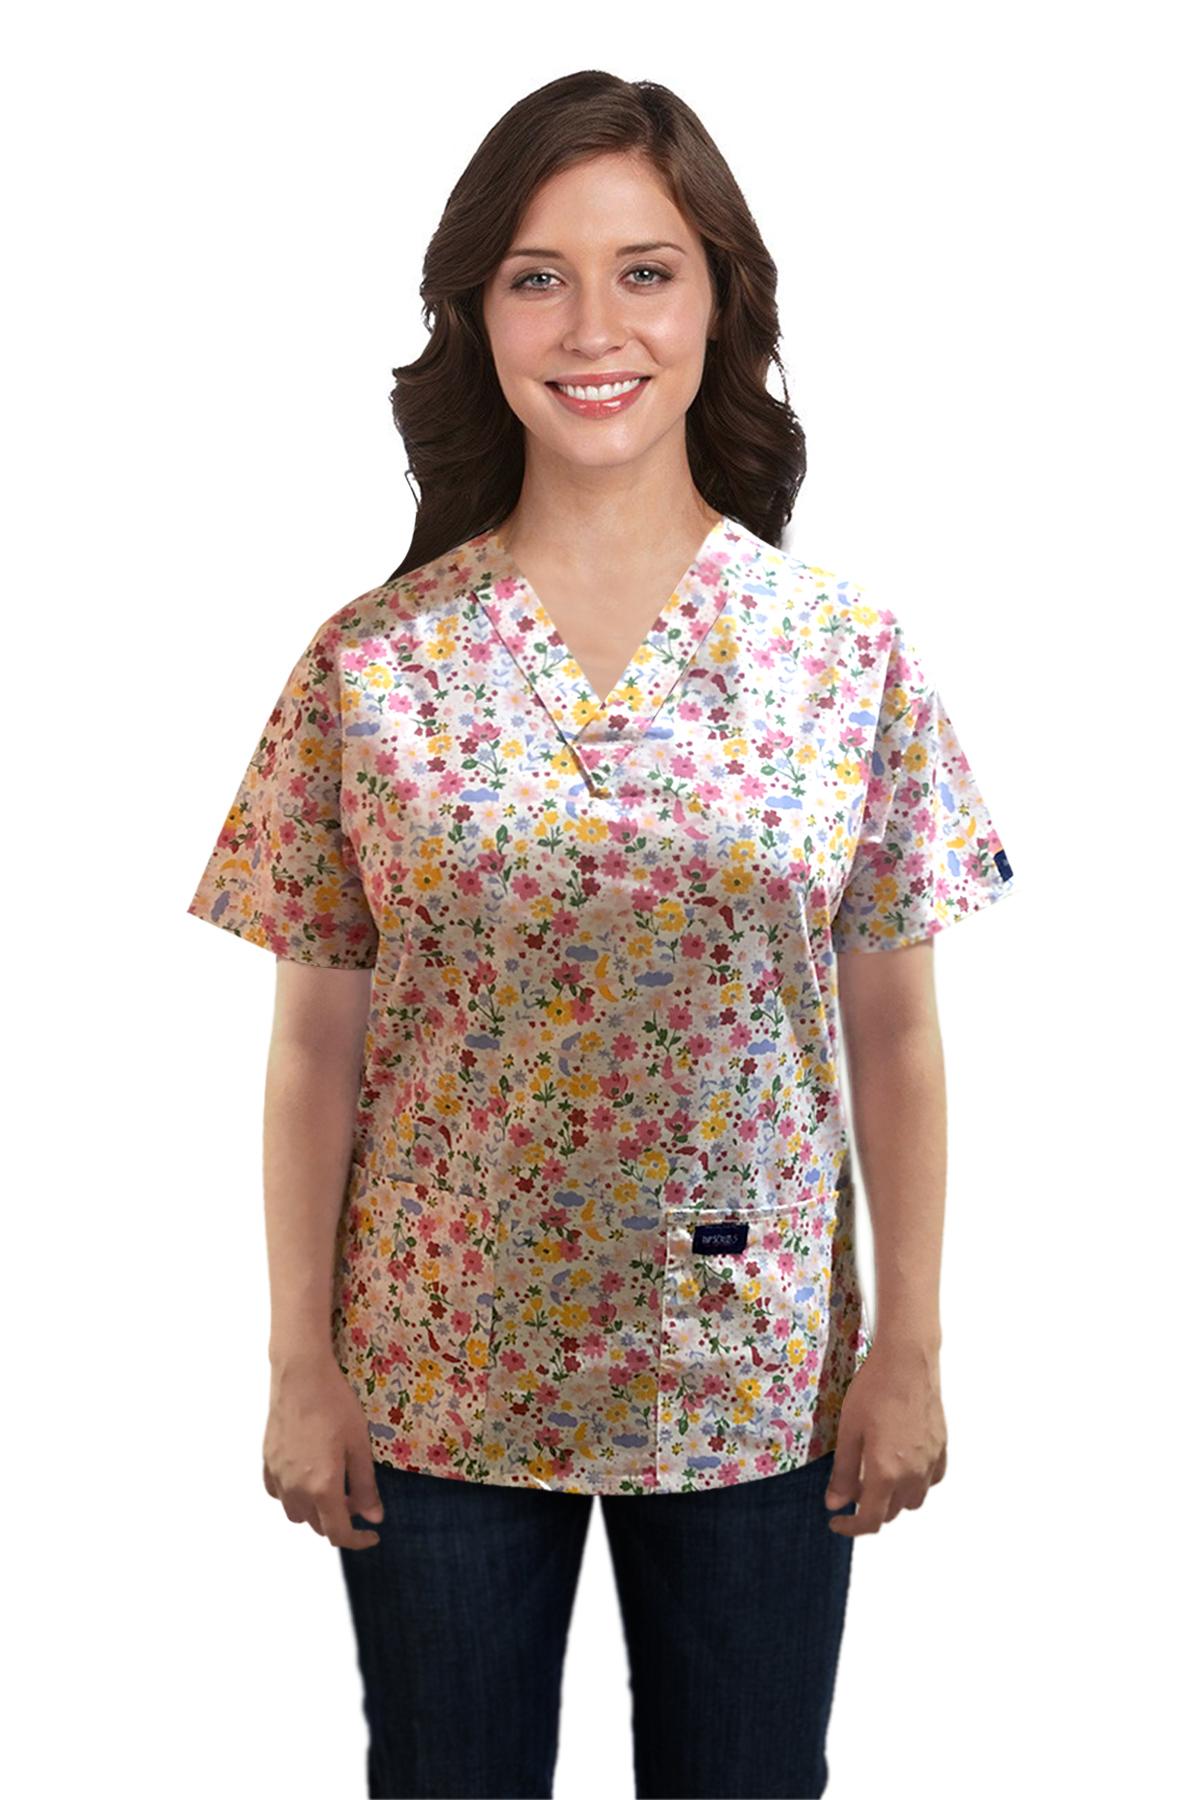 Printed scrub set 4 pocket ladies half sleeve Multi flower Print (2 pocket top and 2 pocket pant)